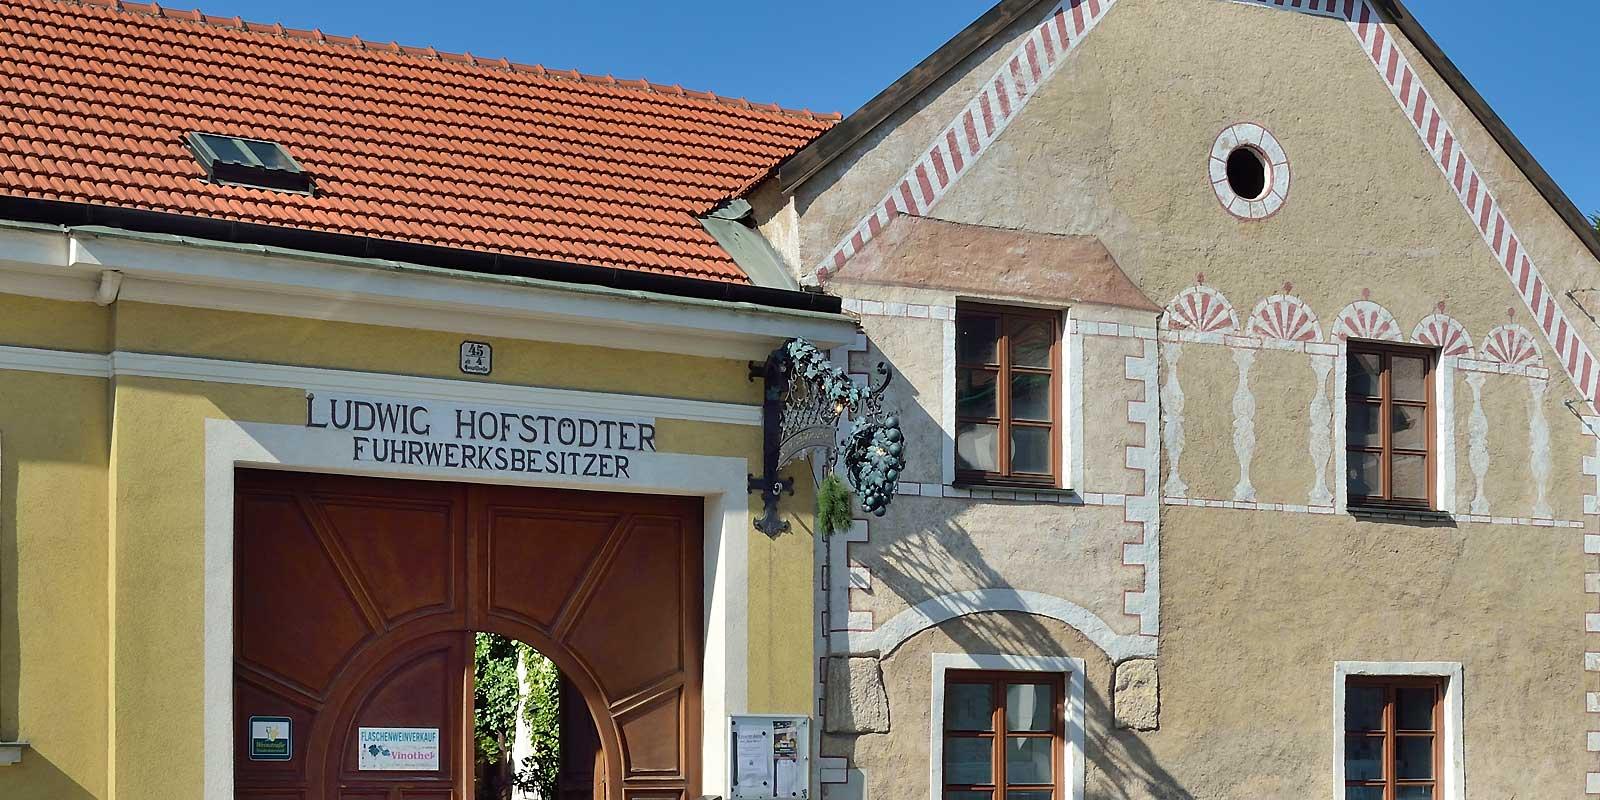 HEURIGER & BUSCHENSCHANK LUDWIG HOFSTÄDTER